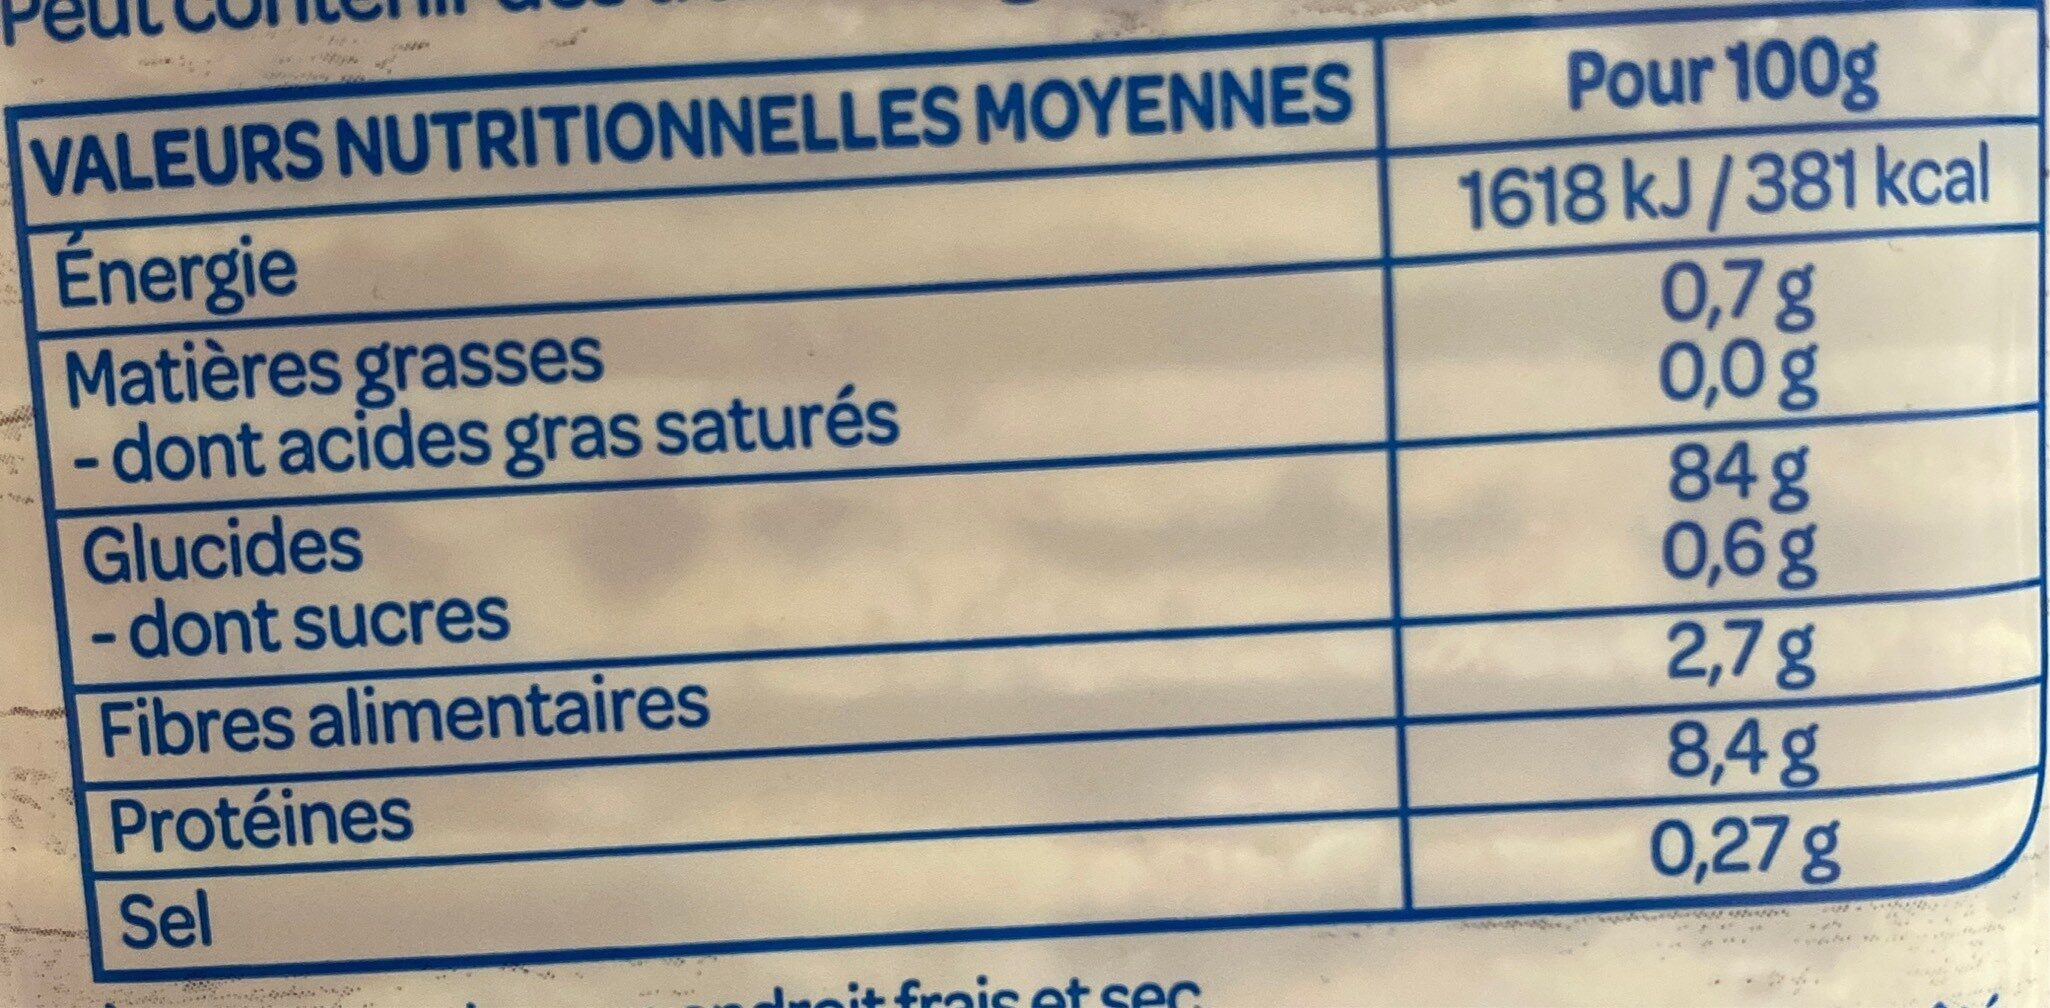 Galettes extra-fines maïs - Informations nutritionnelles - fr